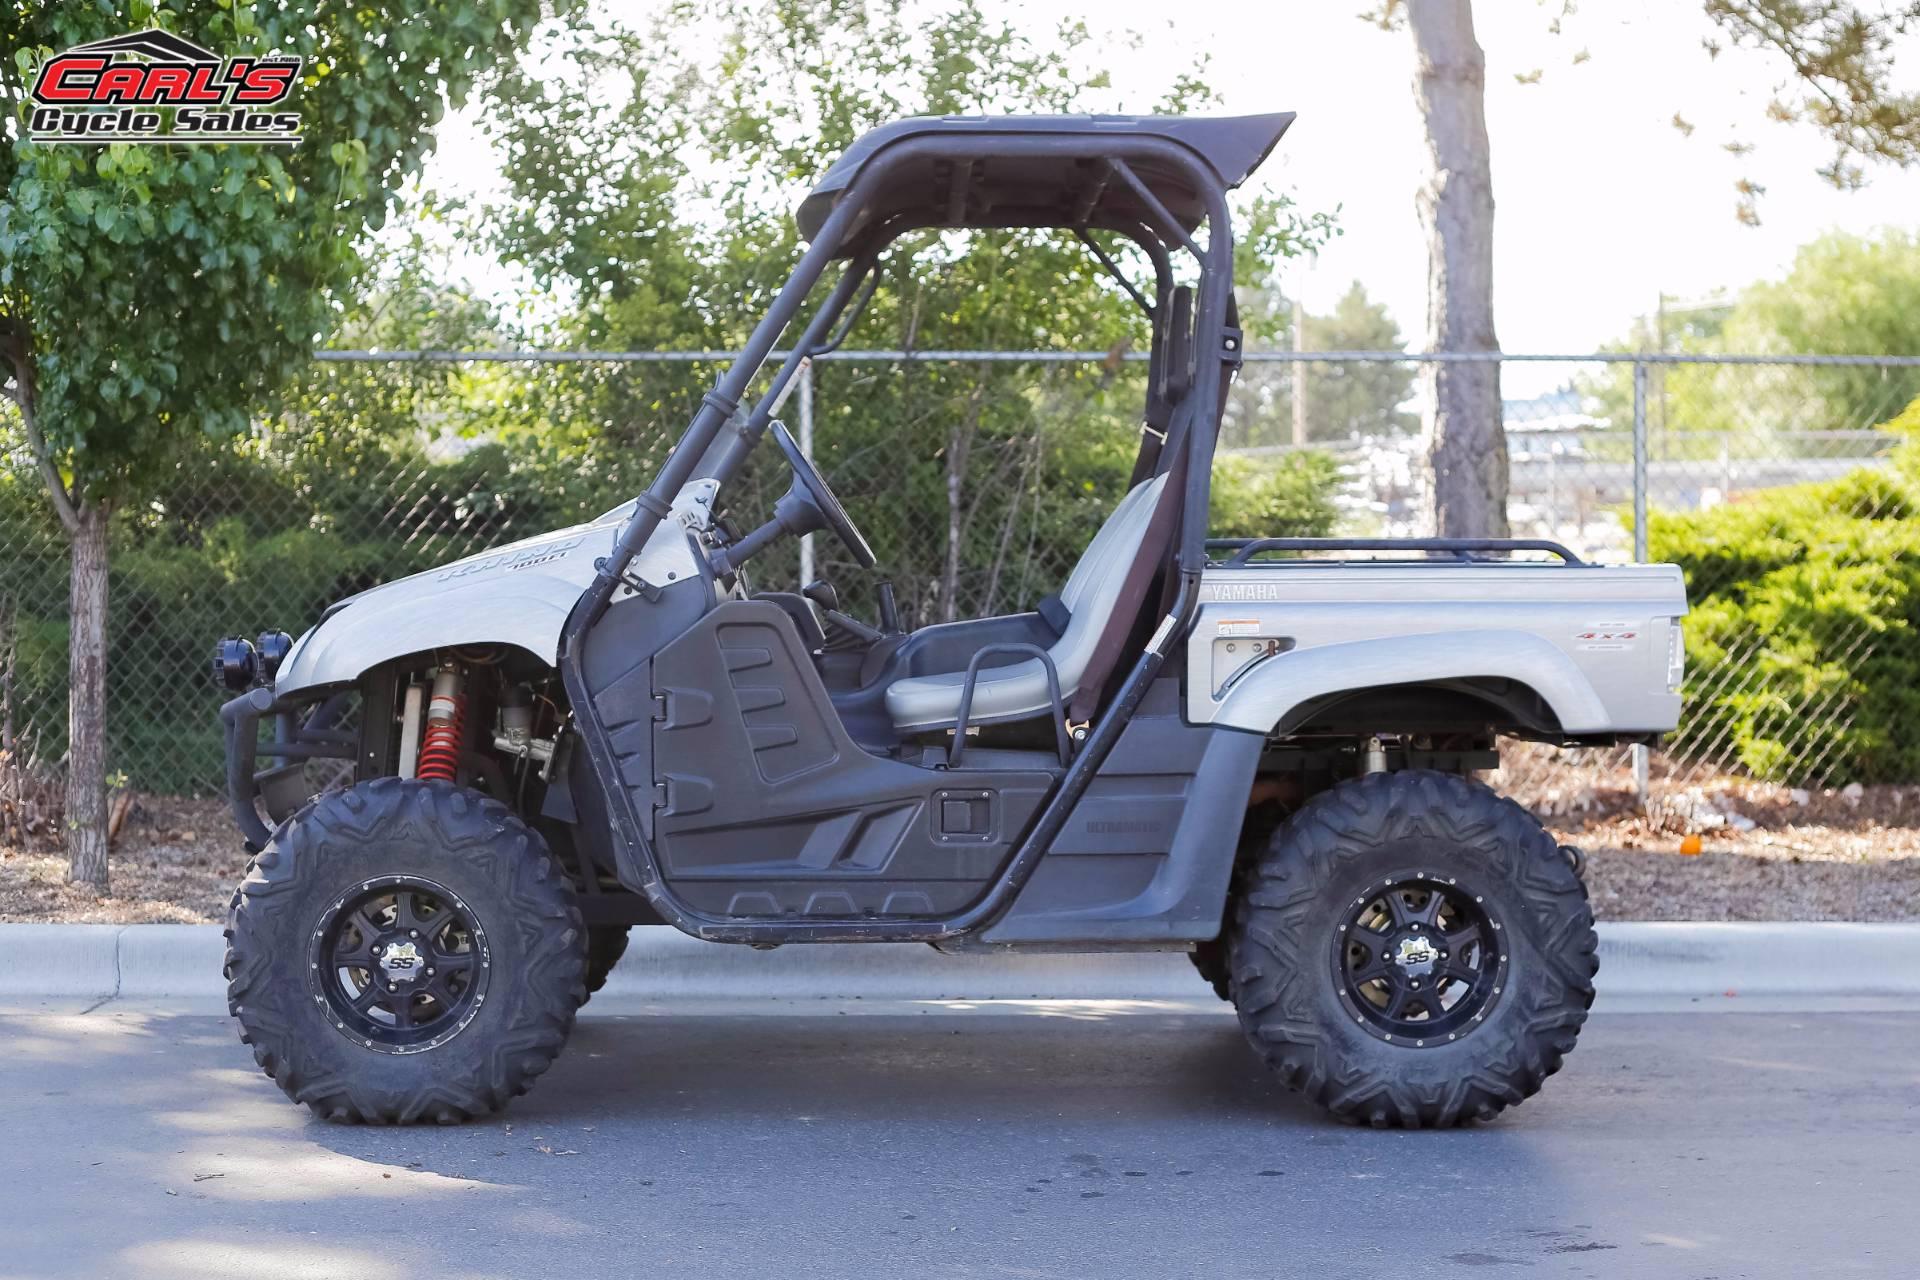 2008 Rhino 700